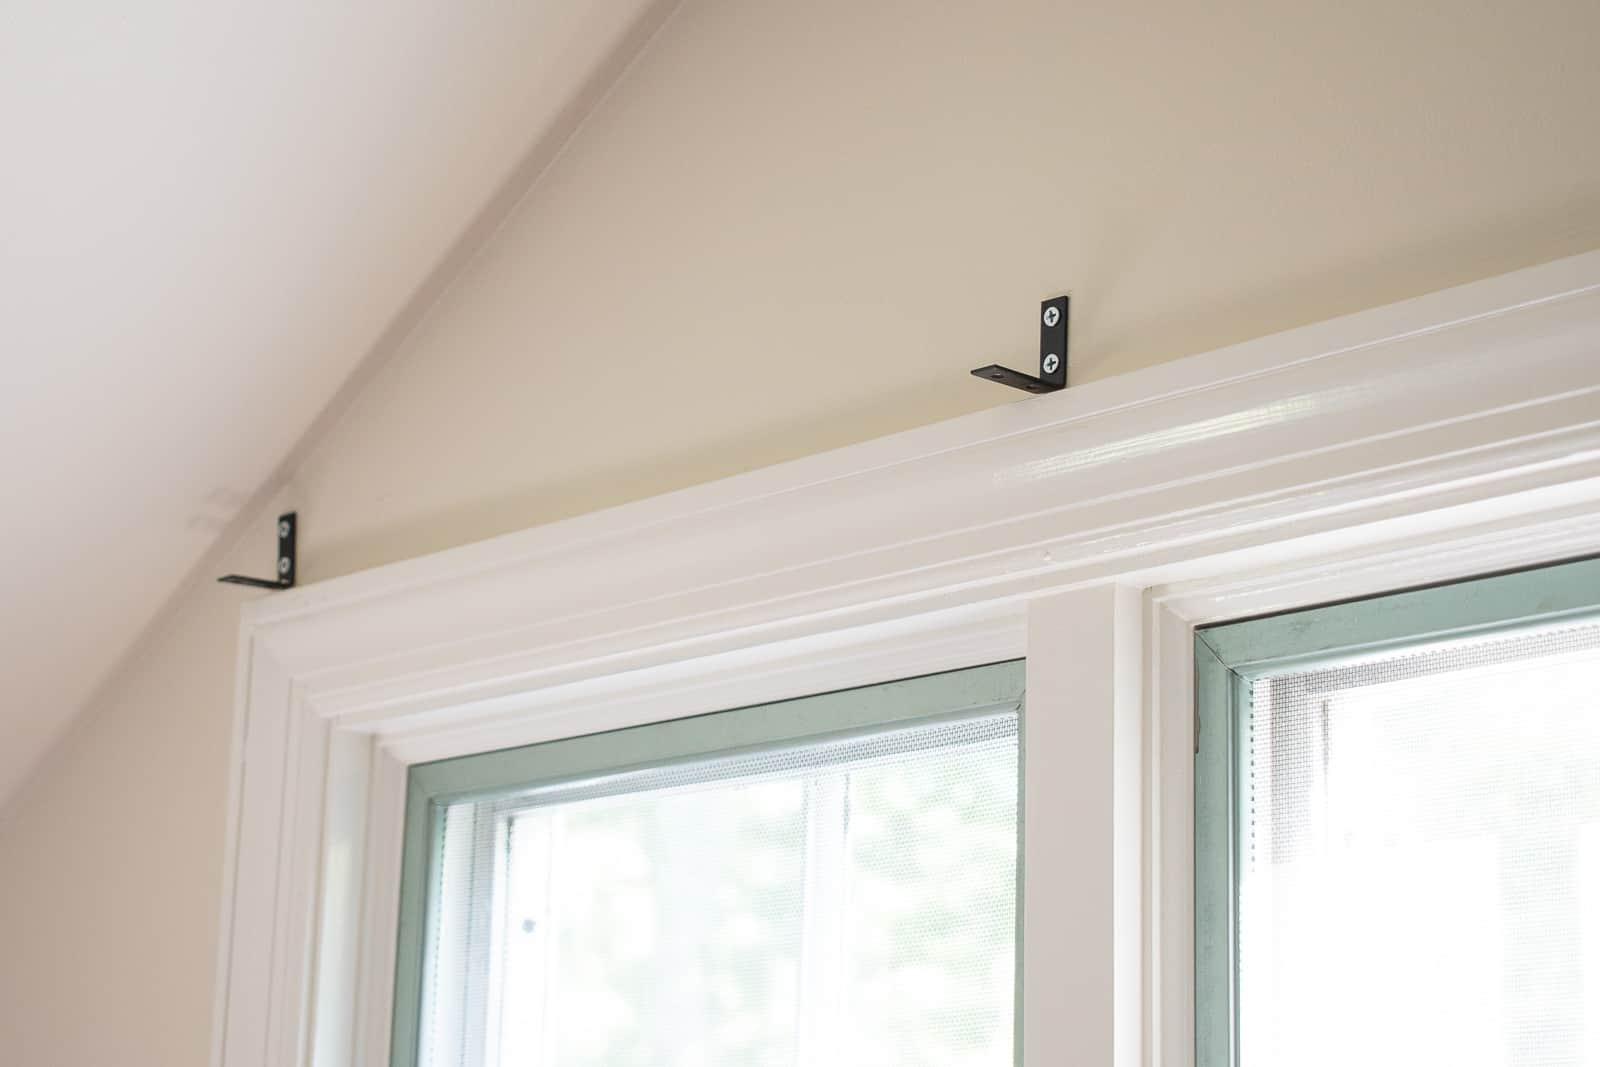 L brackets above window trim